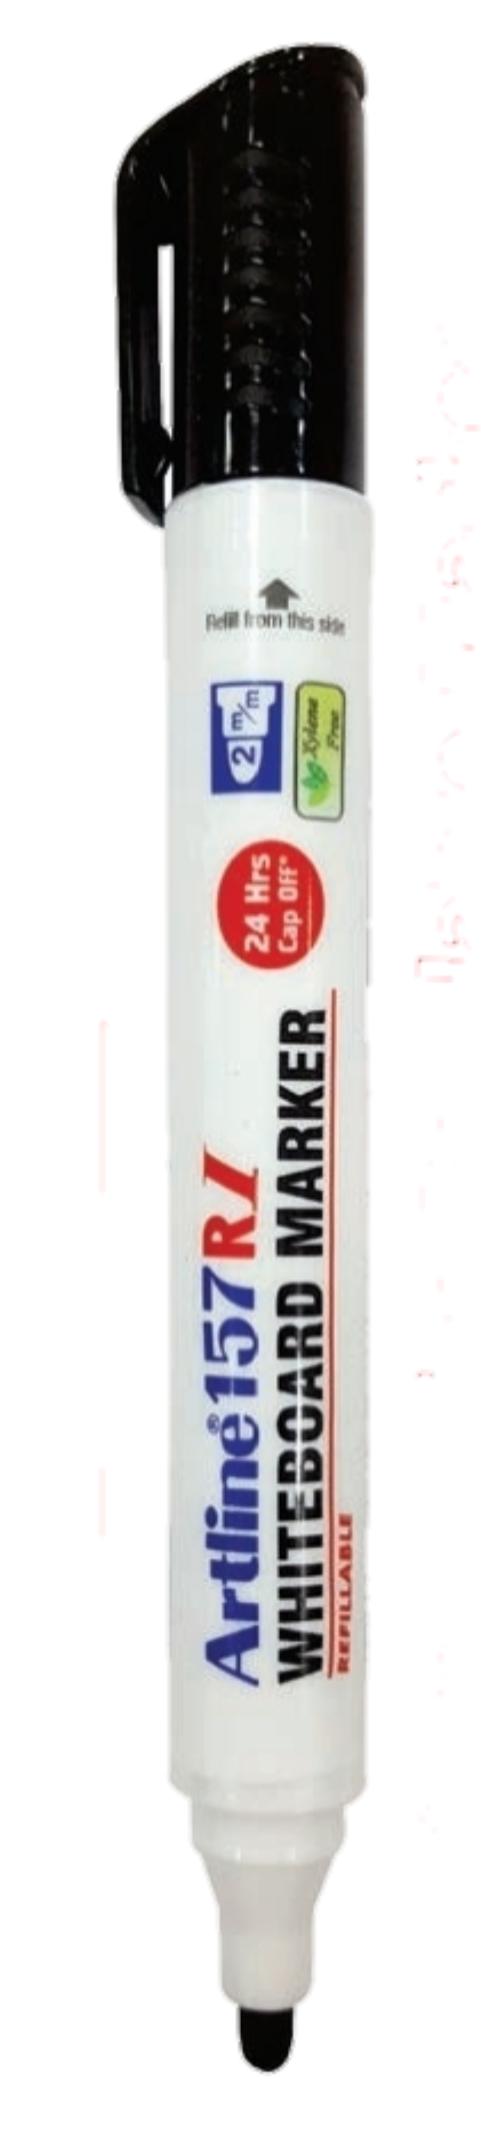 Artline White Board Marker 157 RI Refillable Black Colour Pack of 1 Marker